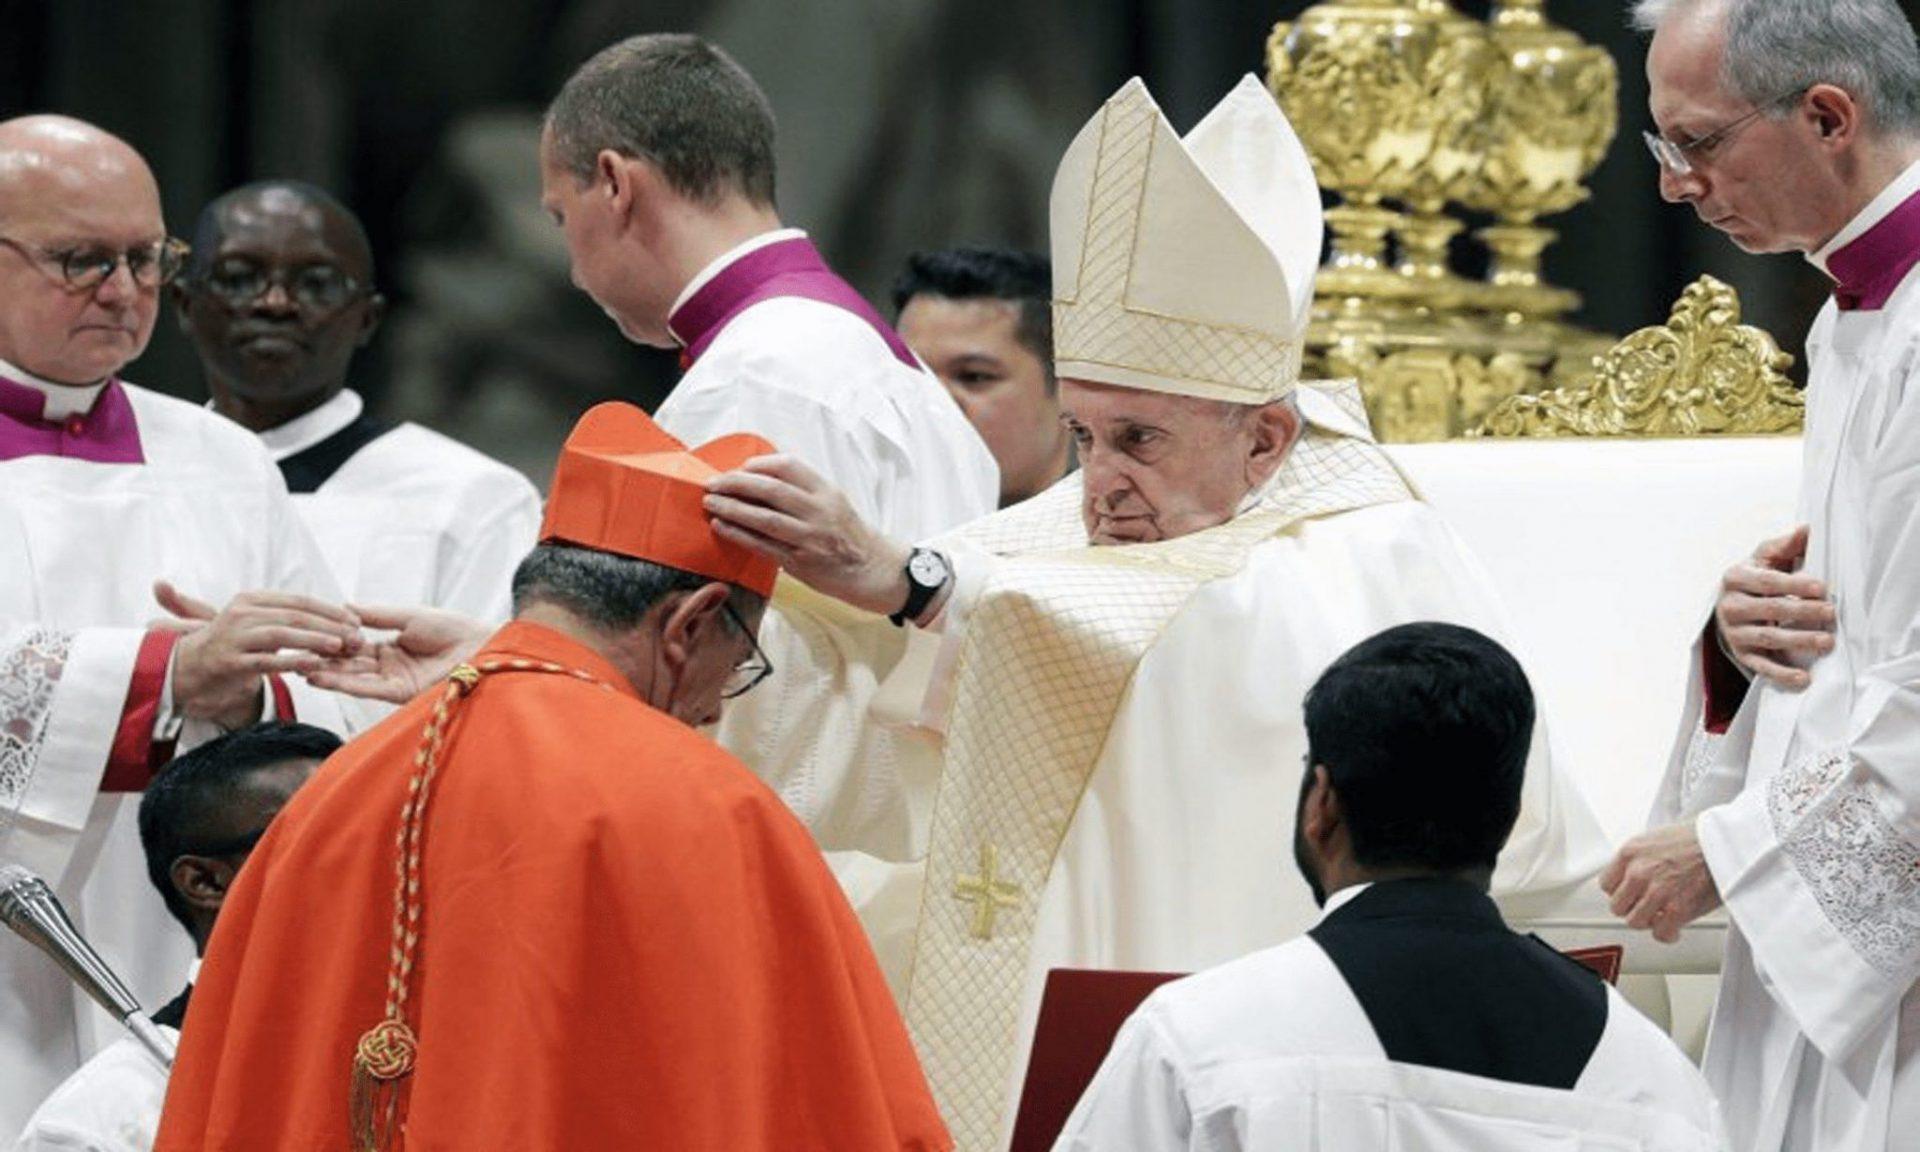 Cardenal-Juan-García